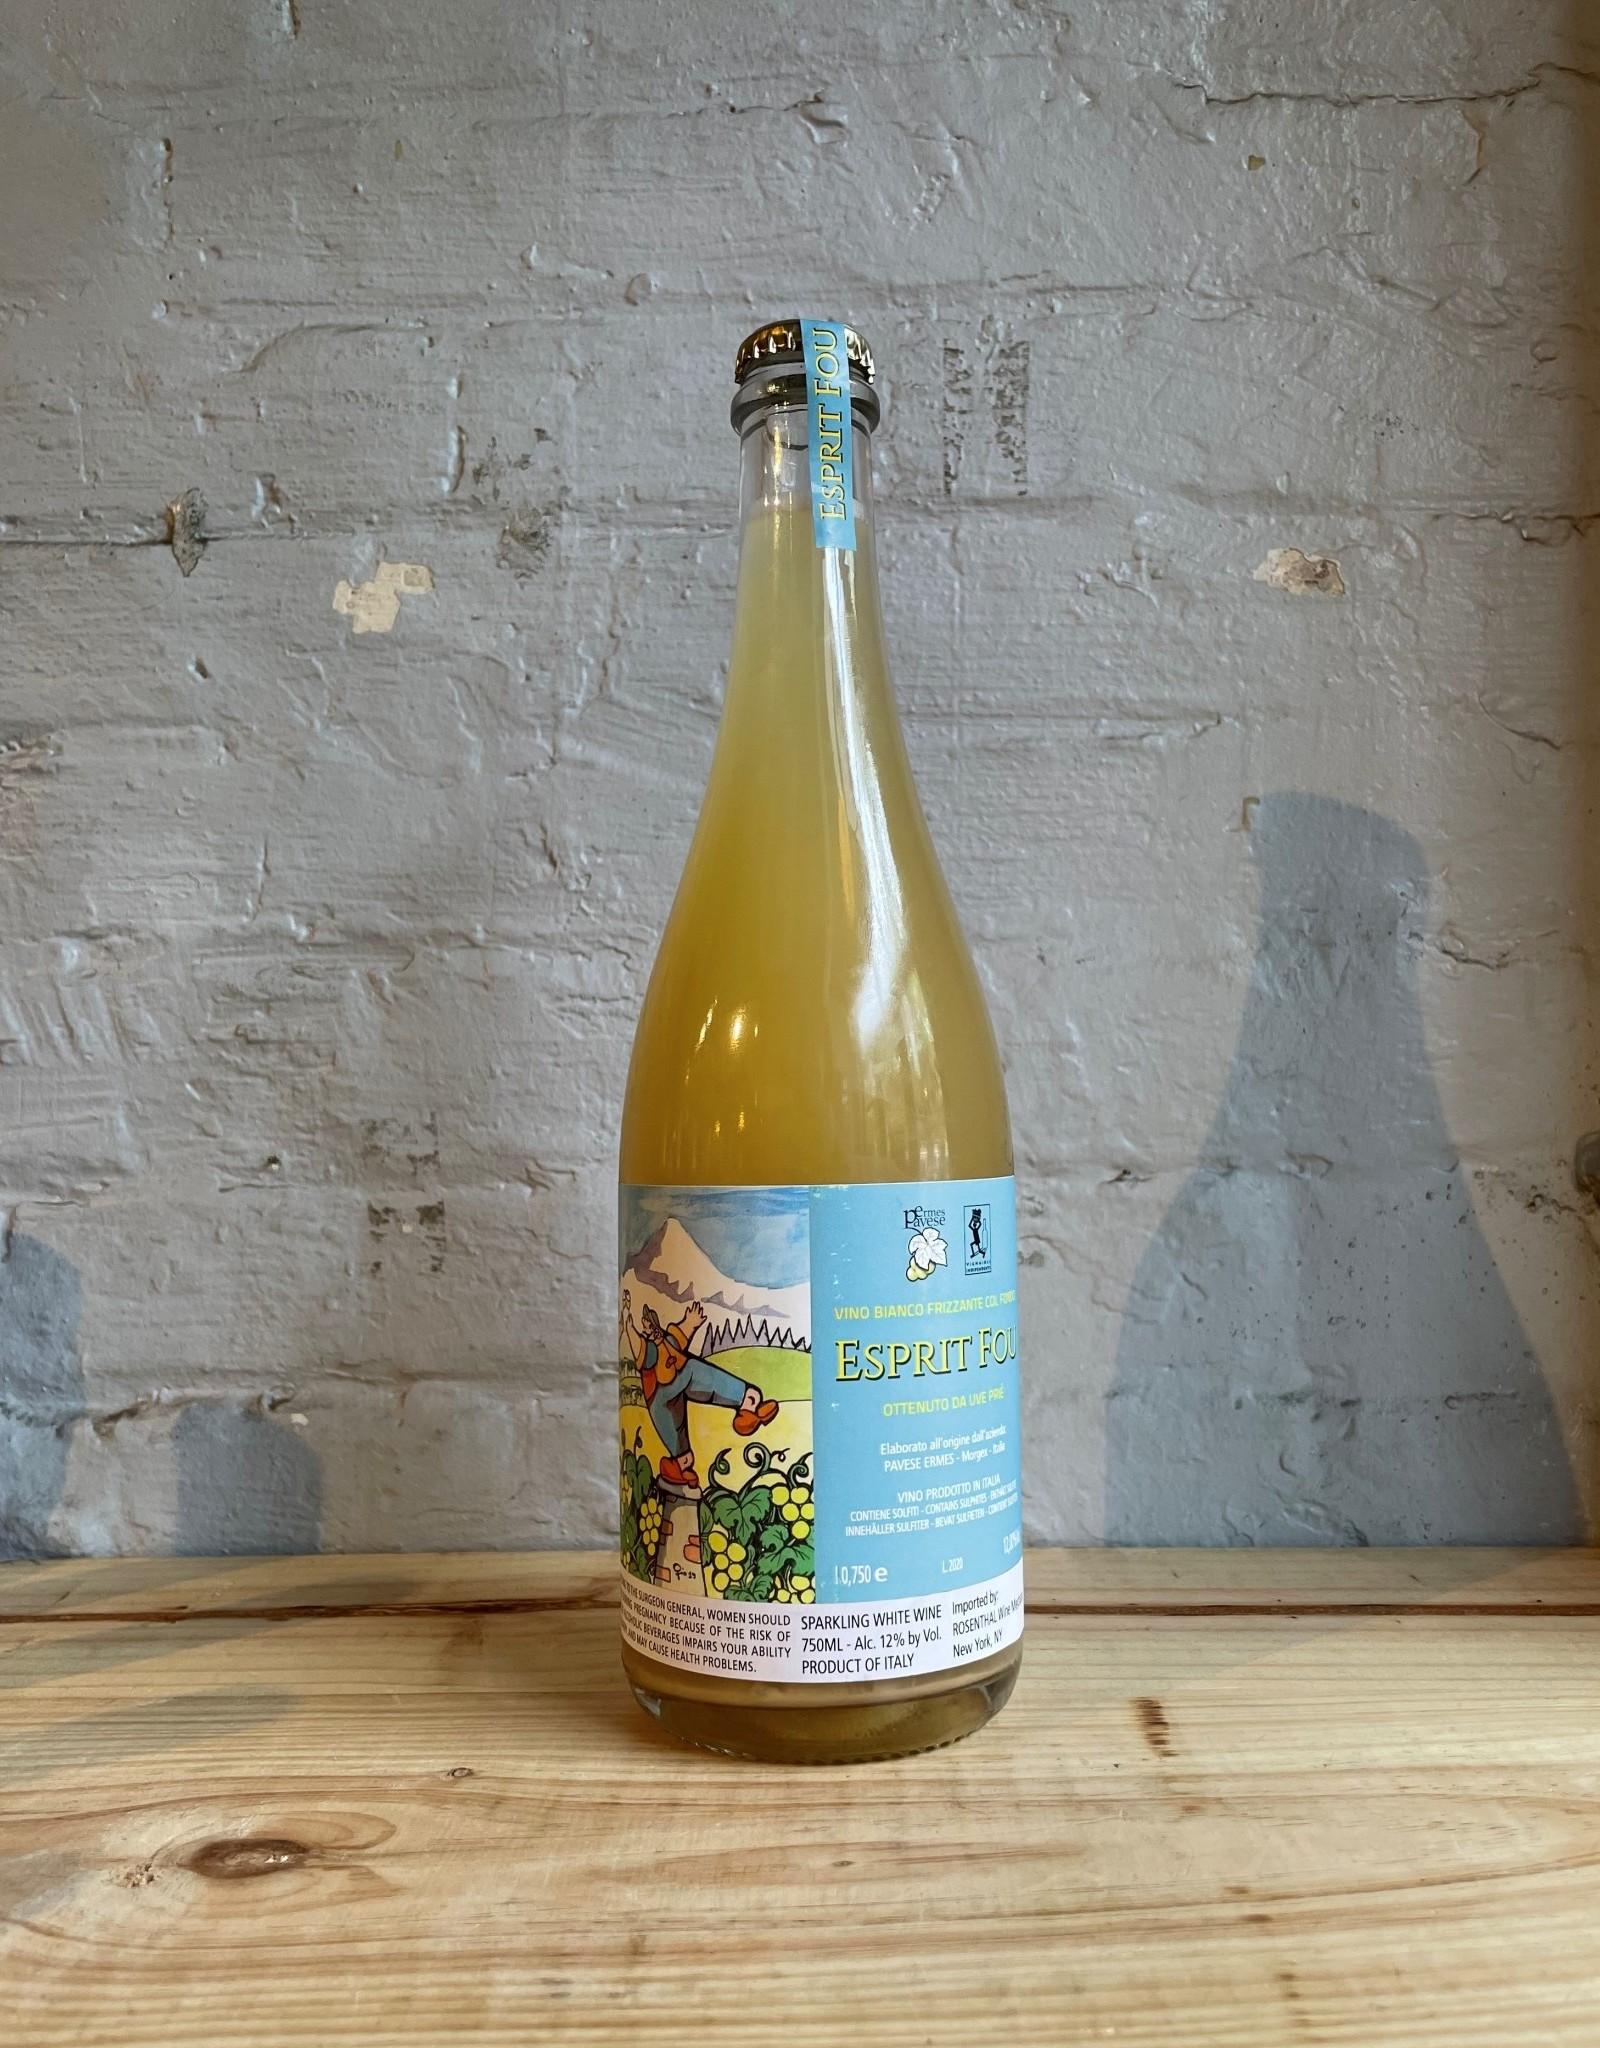 Wine NV Ermes Pavese Esprit Fou Vino Bianco Frizzante Col Fondo - Vallee d'Aoste, Italy (750ml)